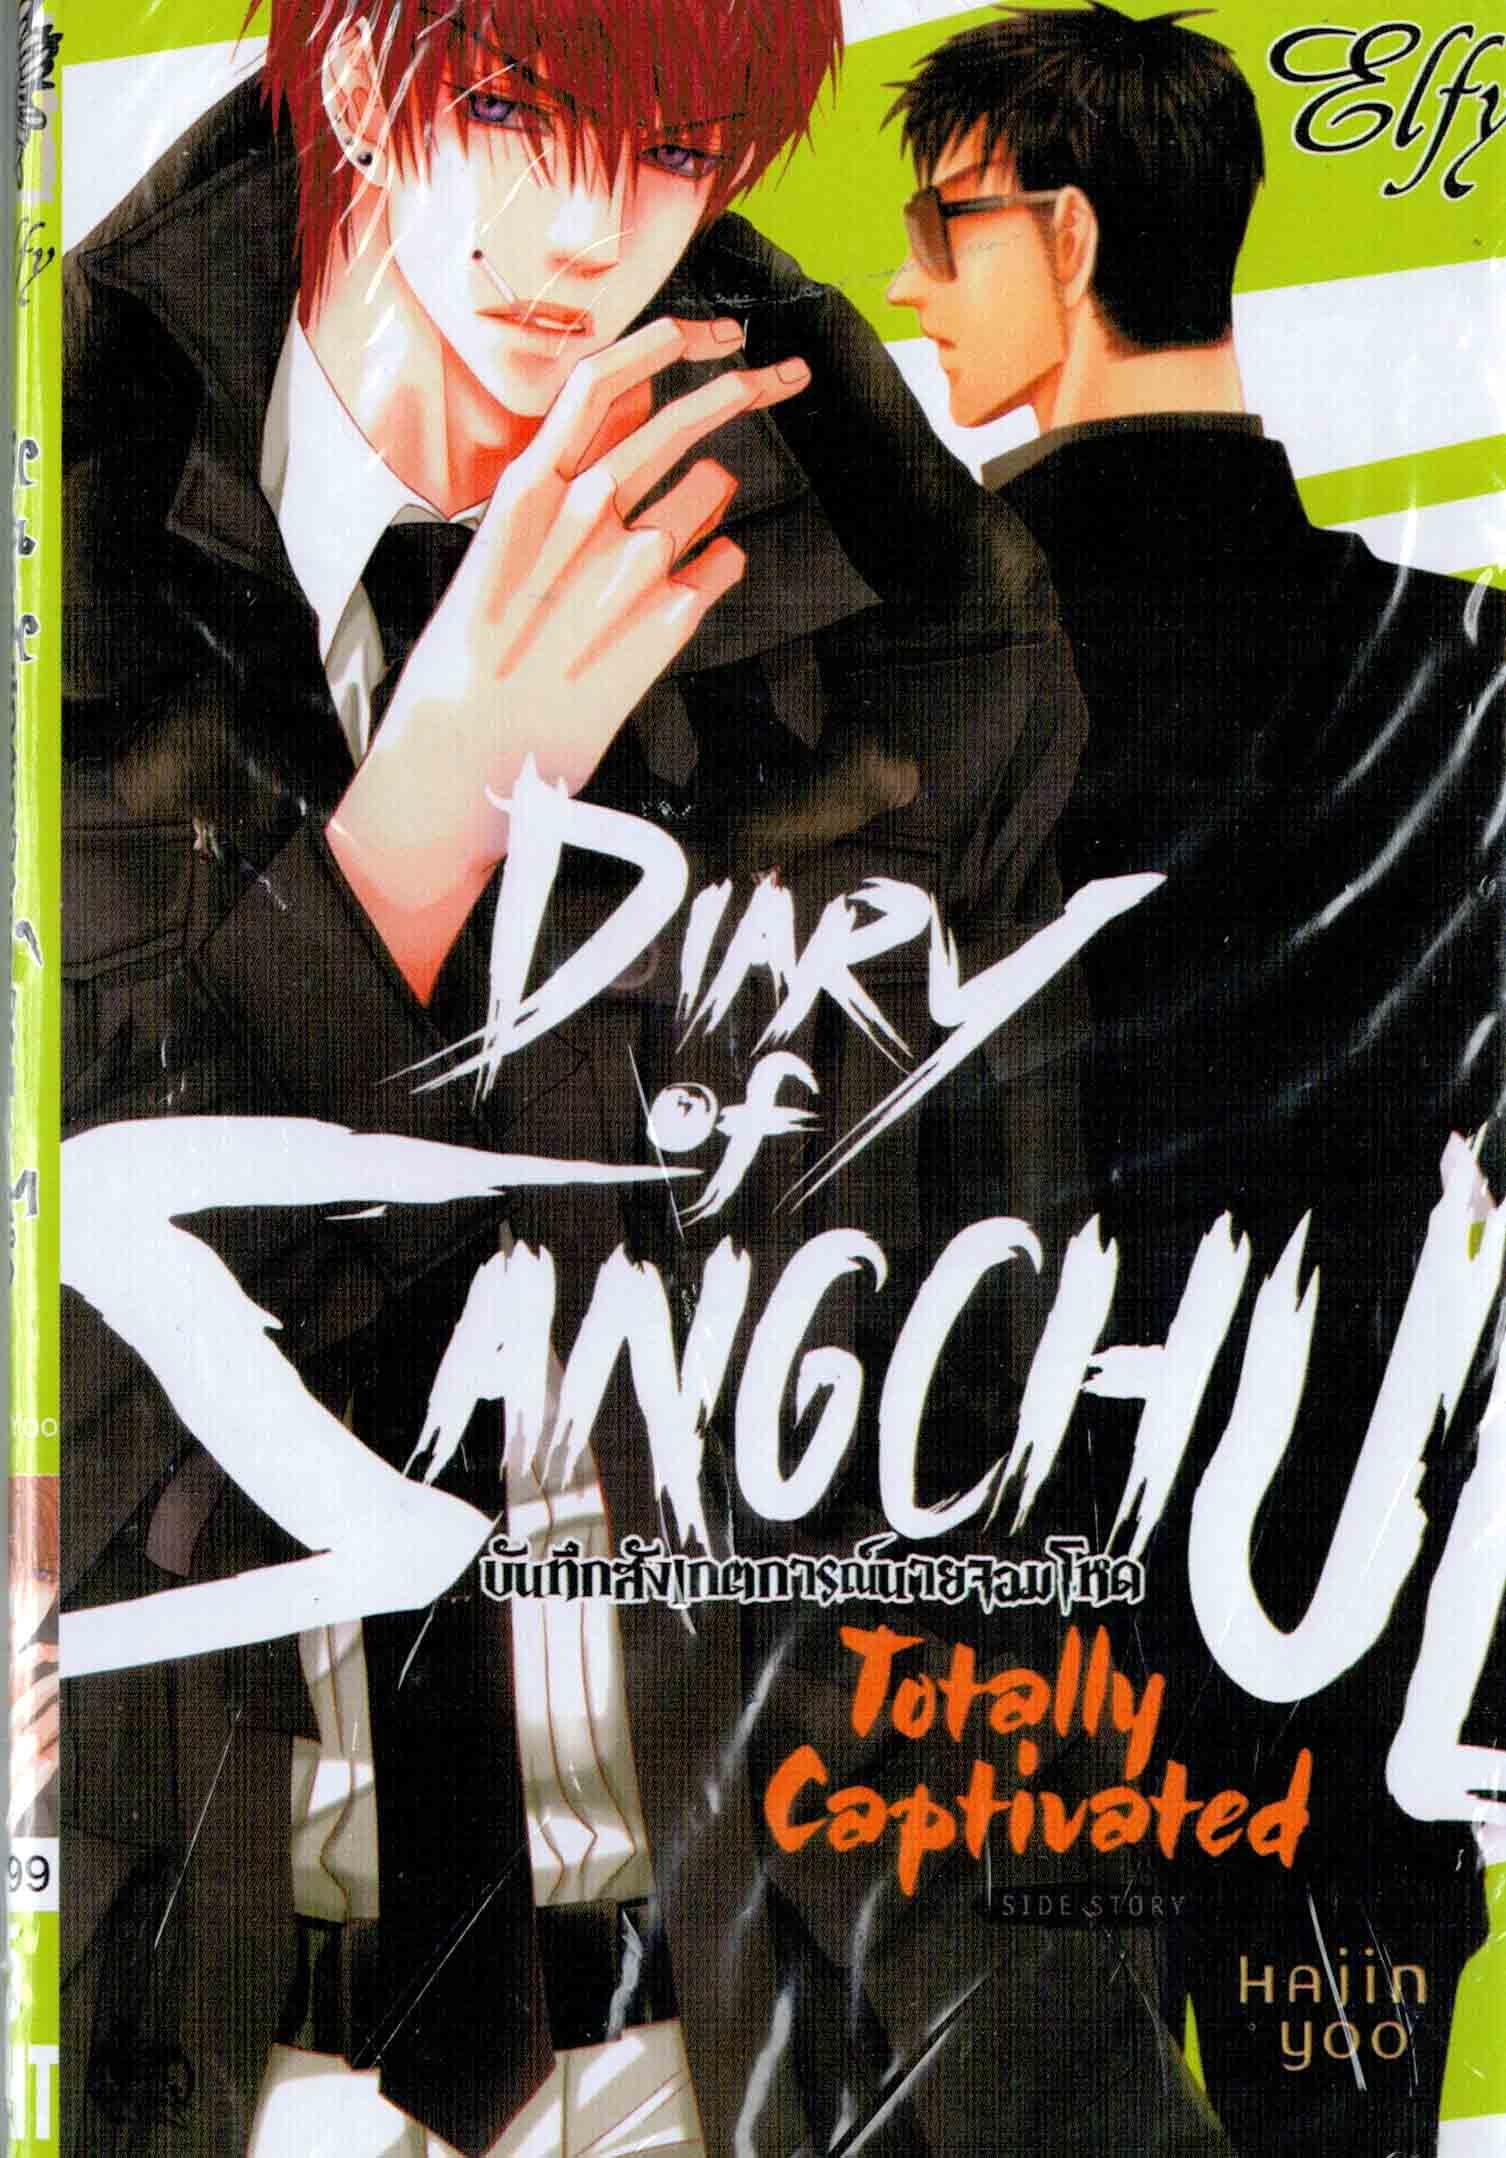 Totally Captivated Side Story - Diary of Sangchul : บันทึกสังเกตการณ์นายจอมโหด : HAJIN YOO